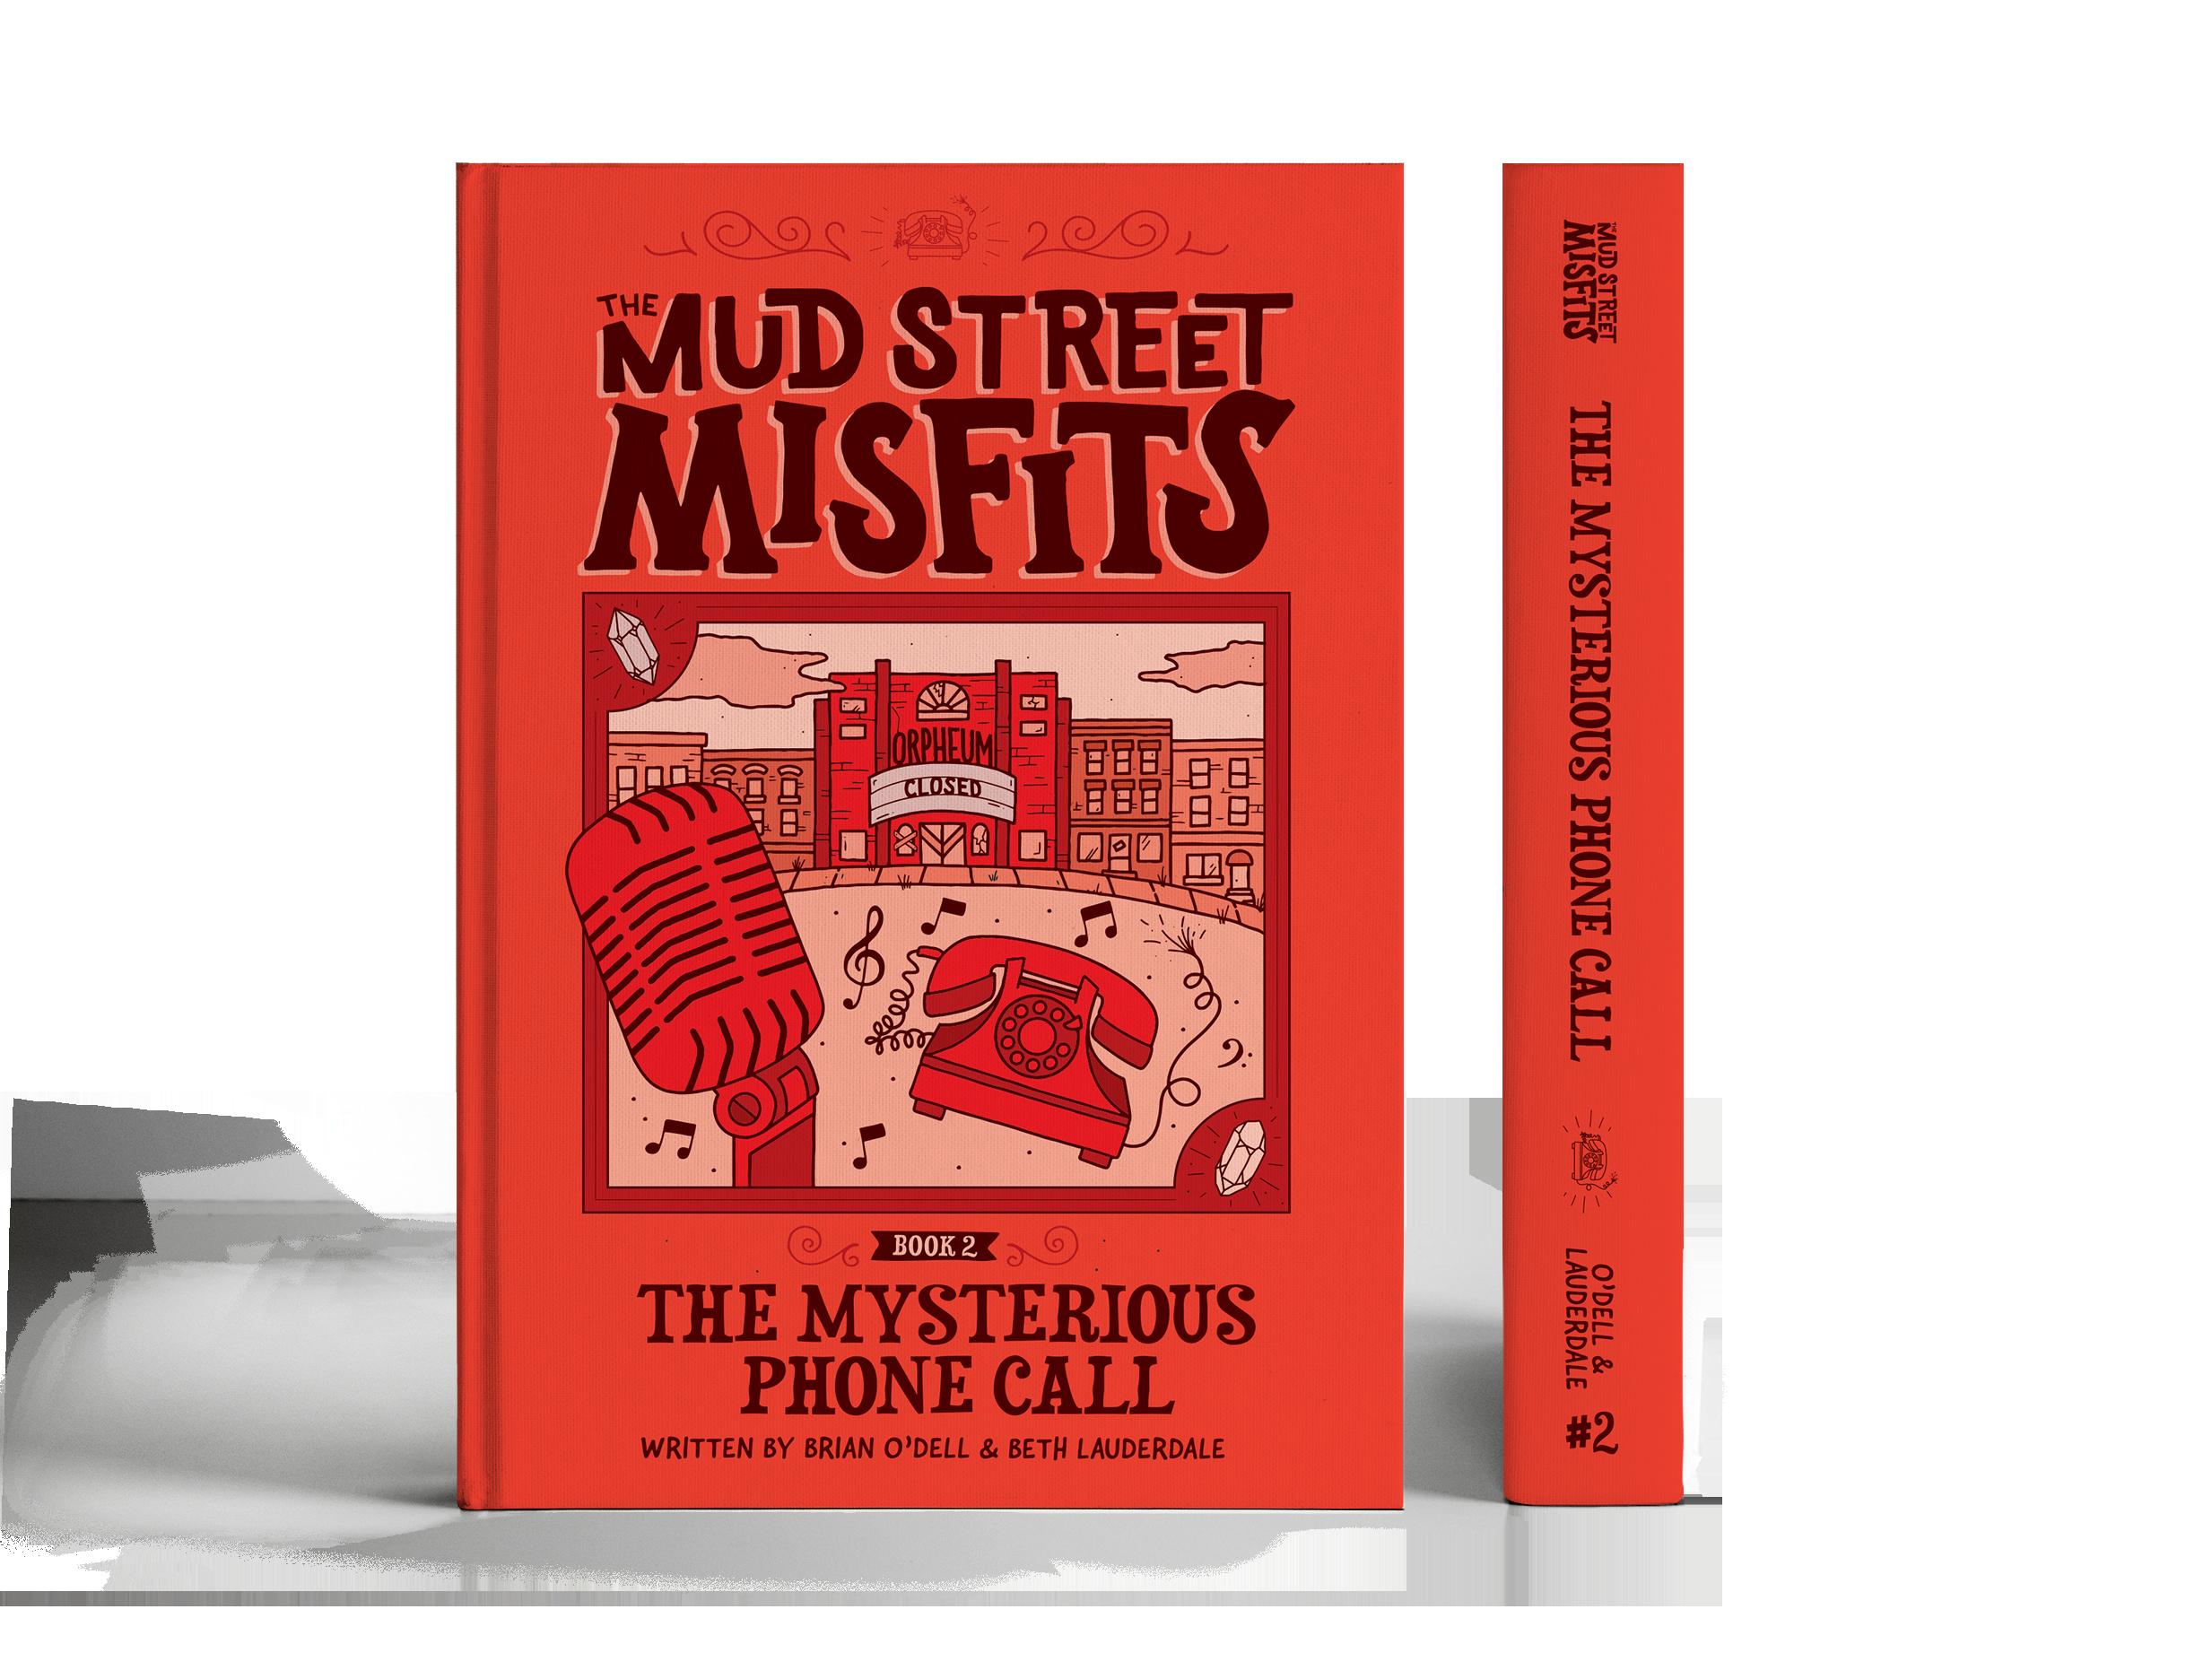 MSM_Book2_HardcoverBookMockUp.png